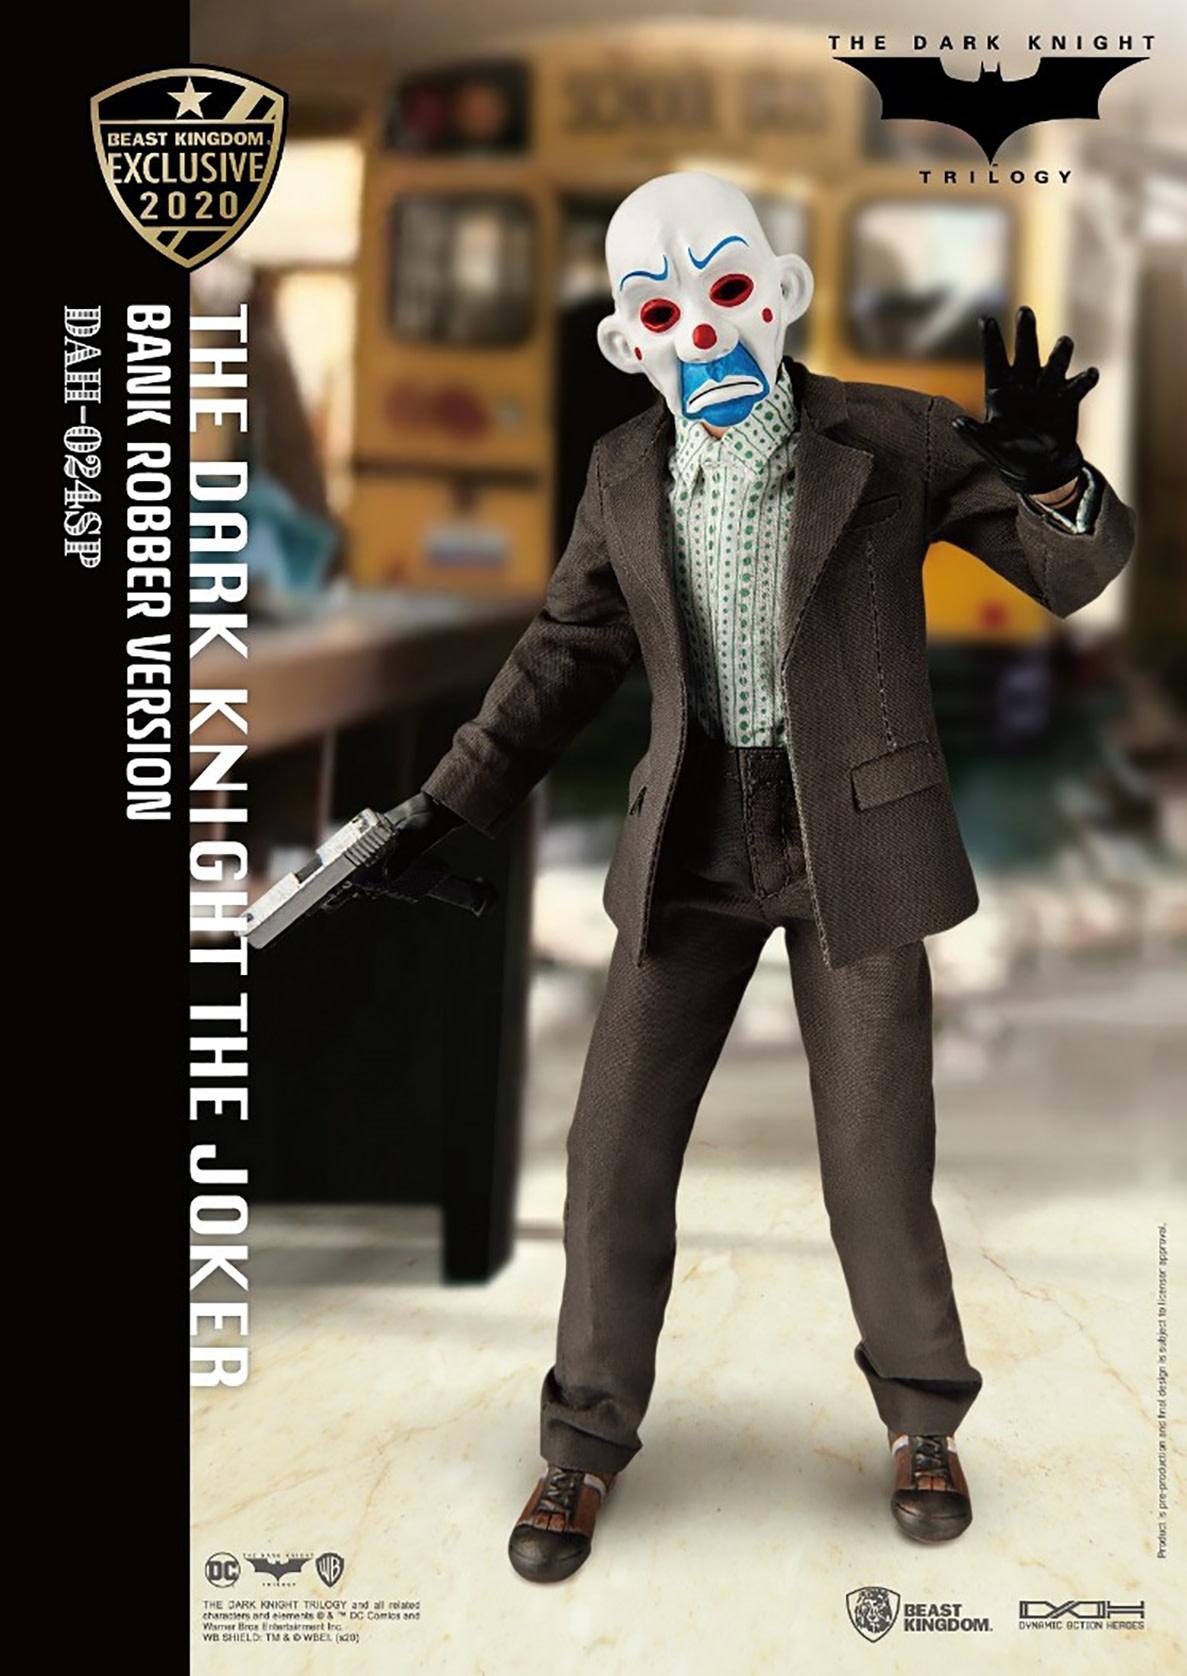 Beast Kingdom DC Comics: The Dark Knight - The Joker Bank Robber Version 1:9 Scale Action Figure